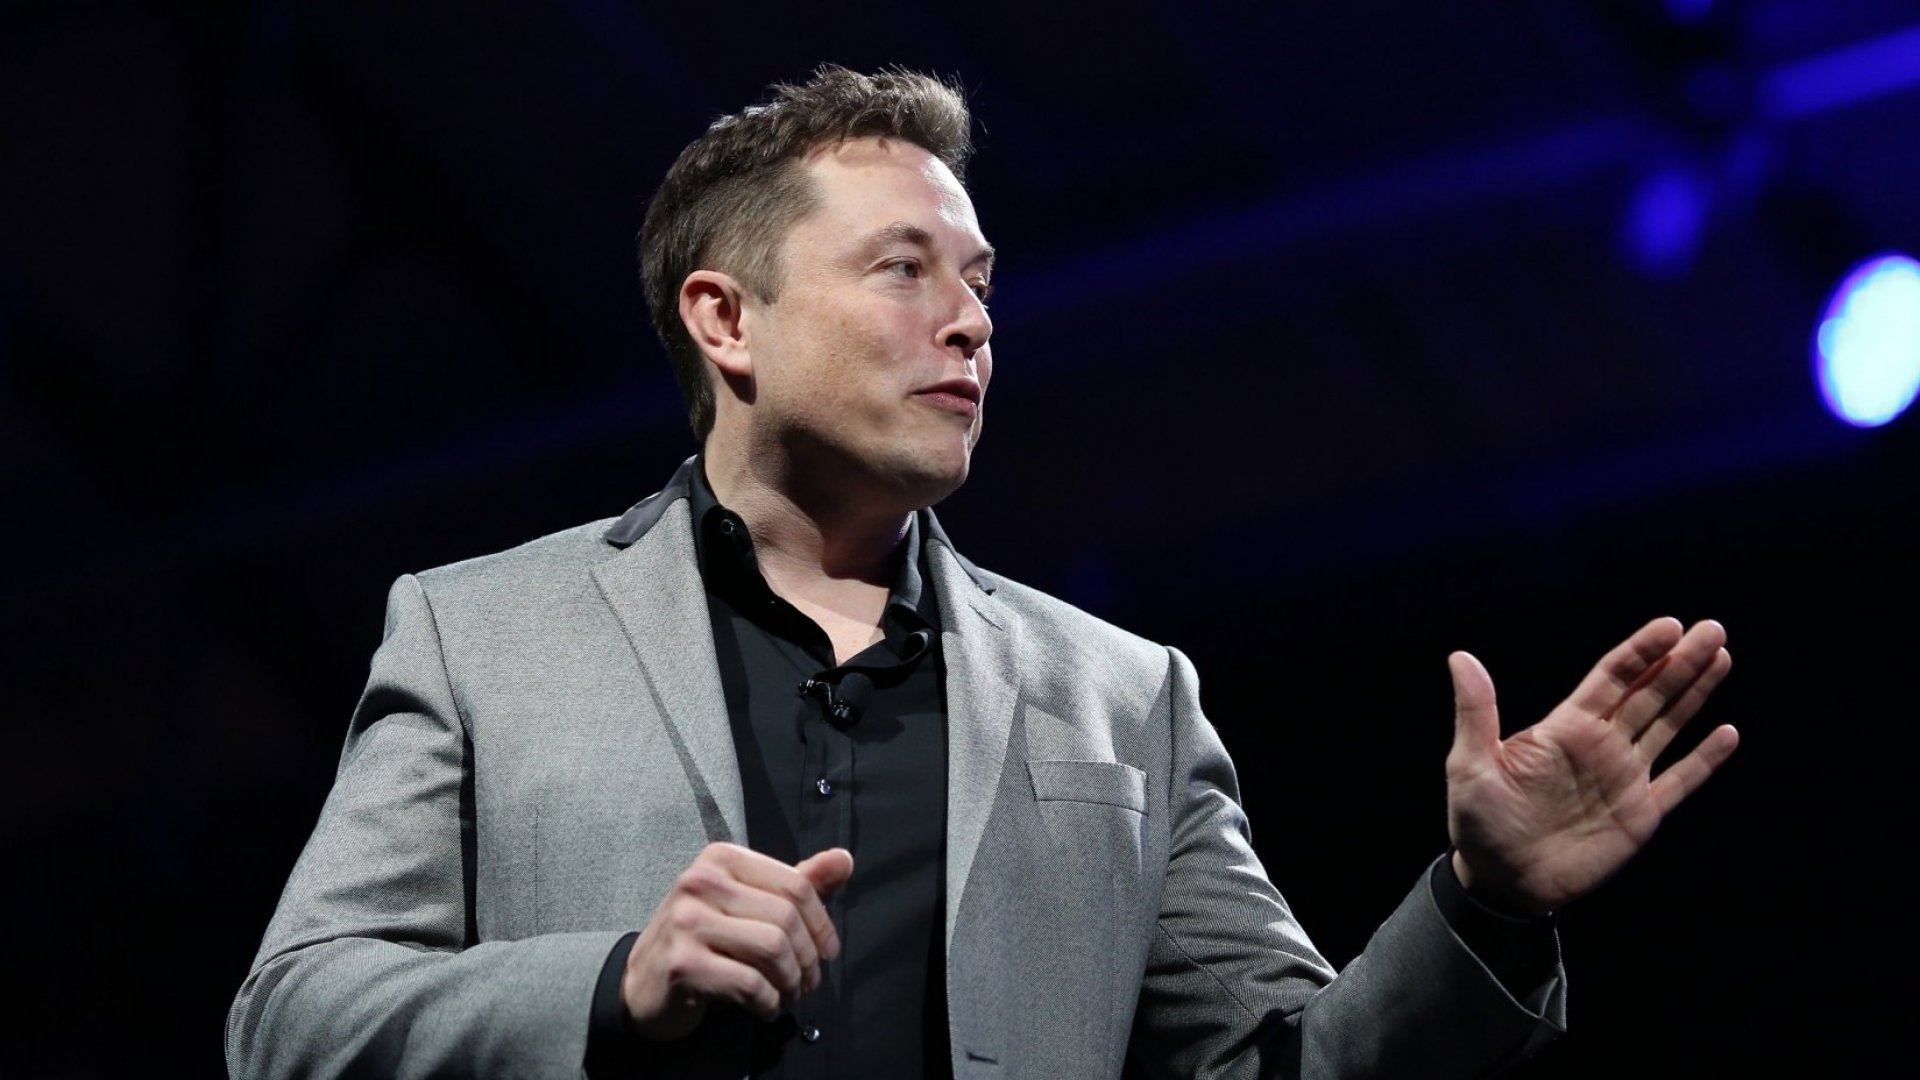 Elon Musk Targets Press, Competitors in Combative Tesla Earnings Call